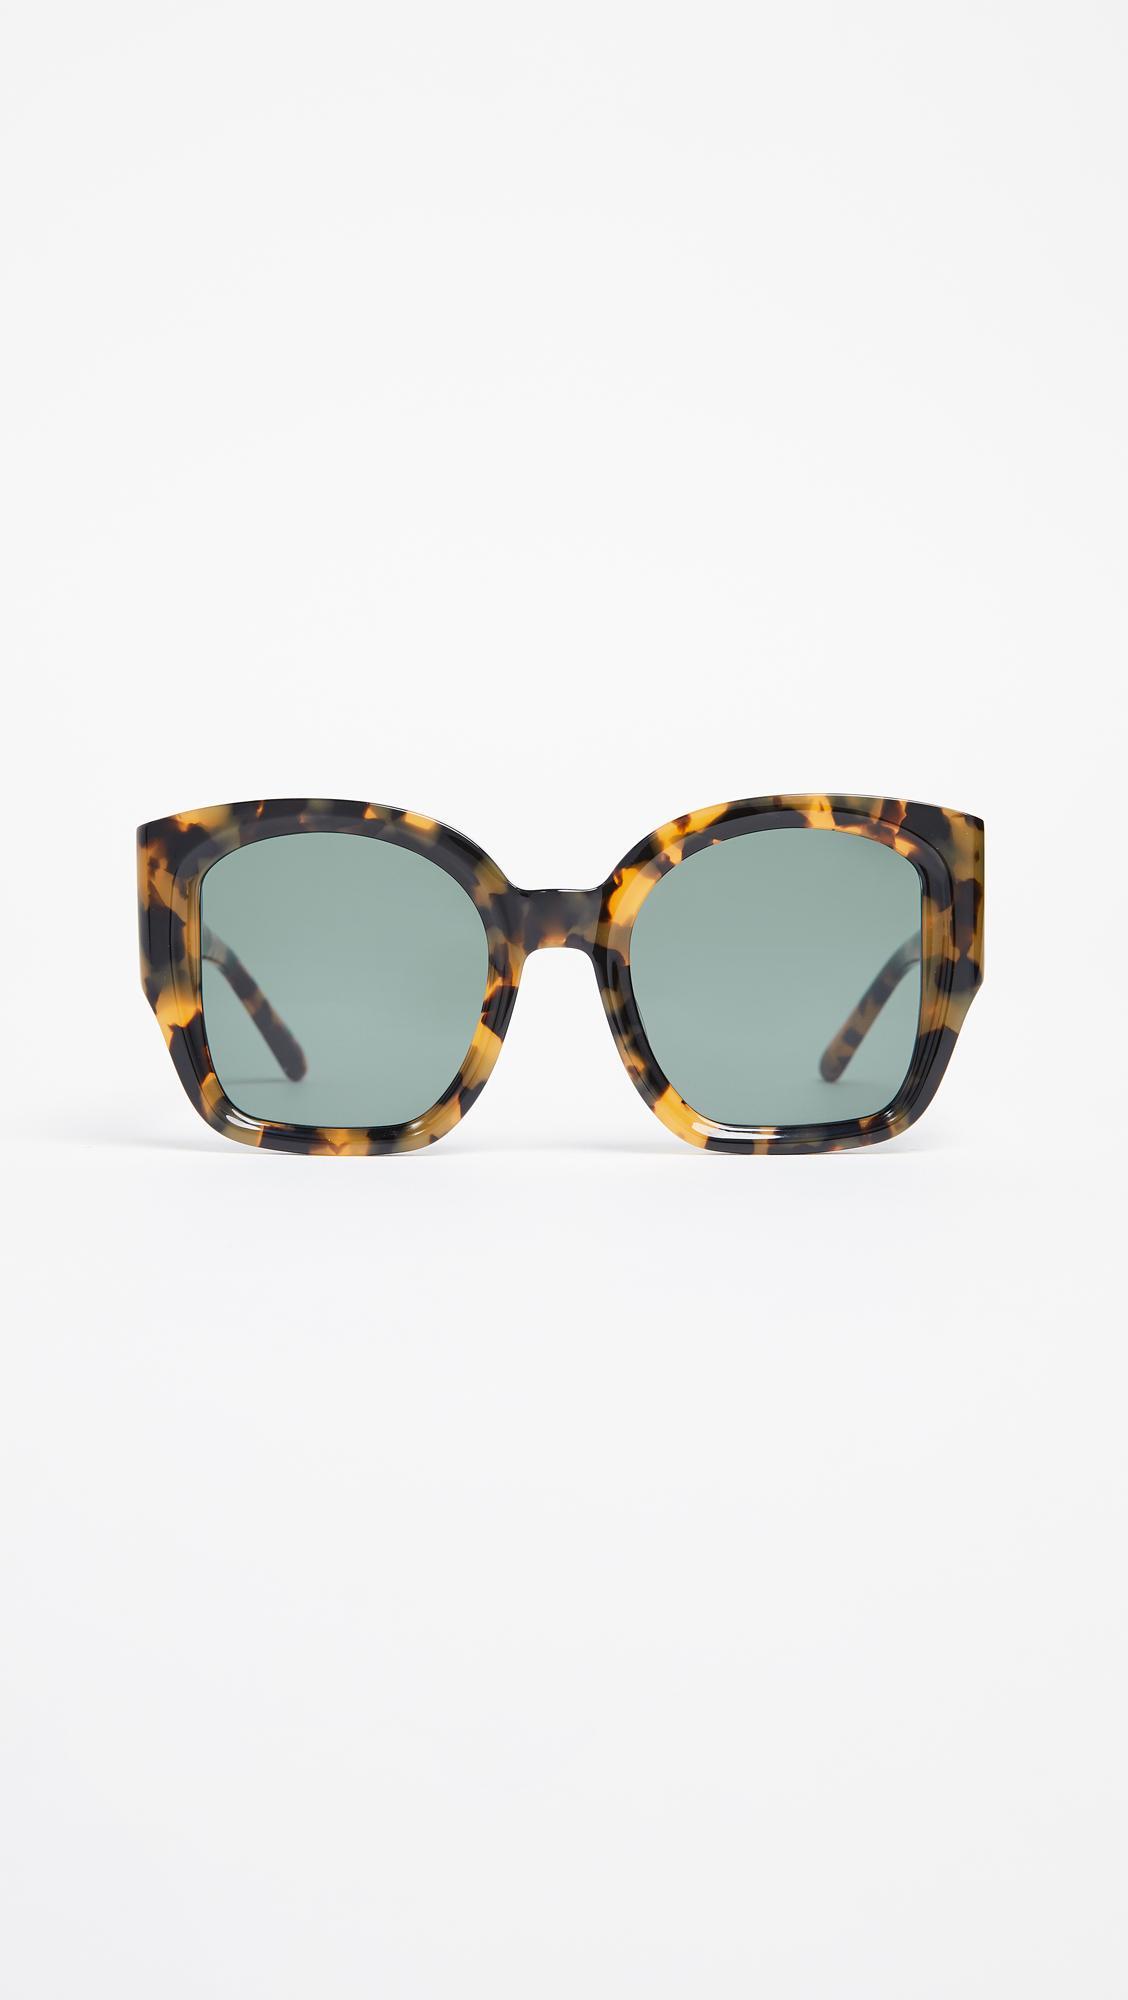 a98f7126beba ... Alternative Fit Check Mate Sunglasses - Lyst. View fullscreen